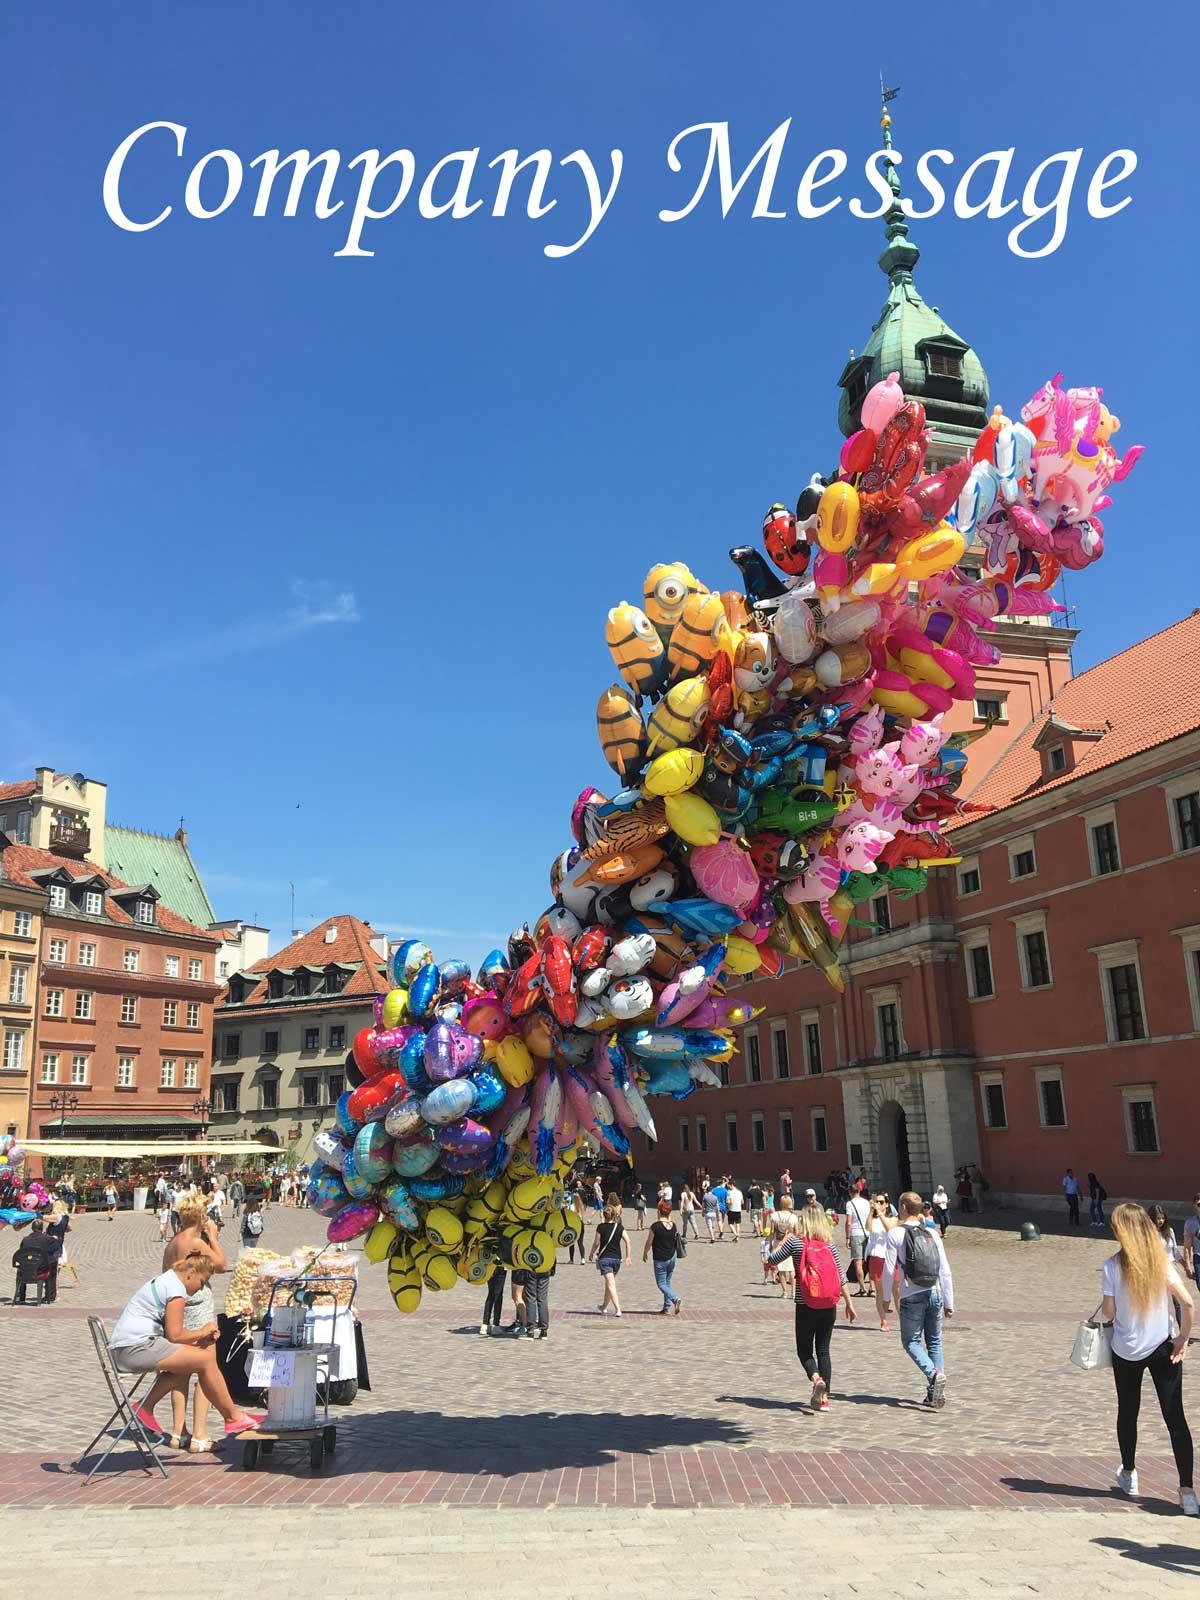 La Vida Linda Company Message ワルシャワの広場の風船